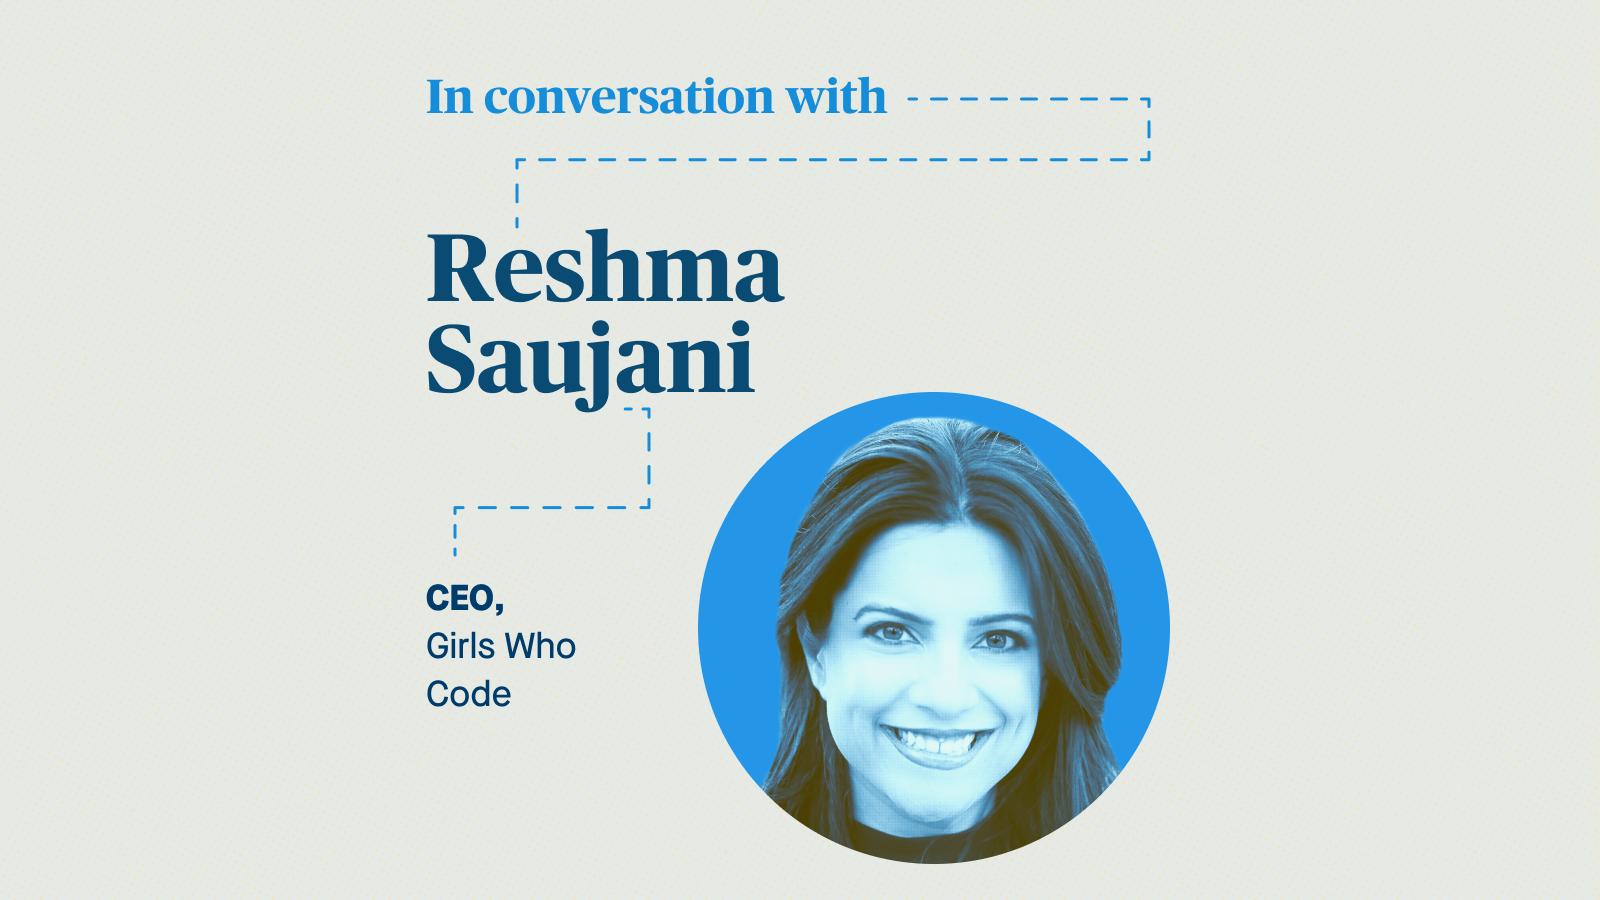 Zach Seward in conversation with Reshma Saujani, CEO of Girls Who Code